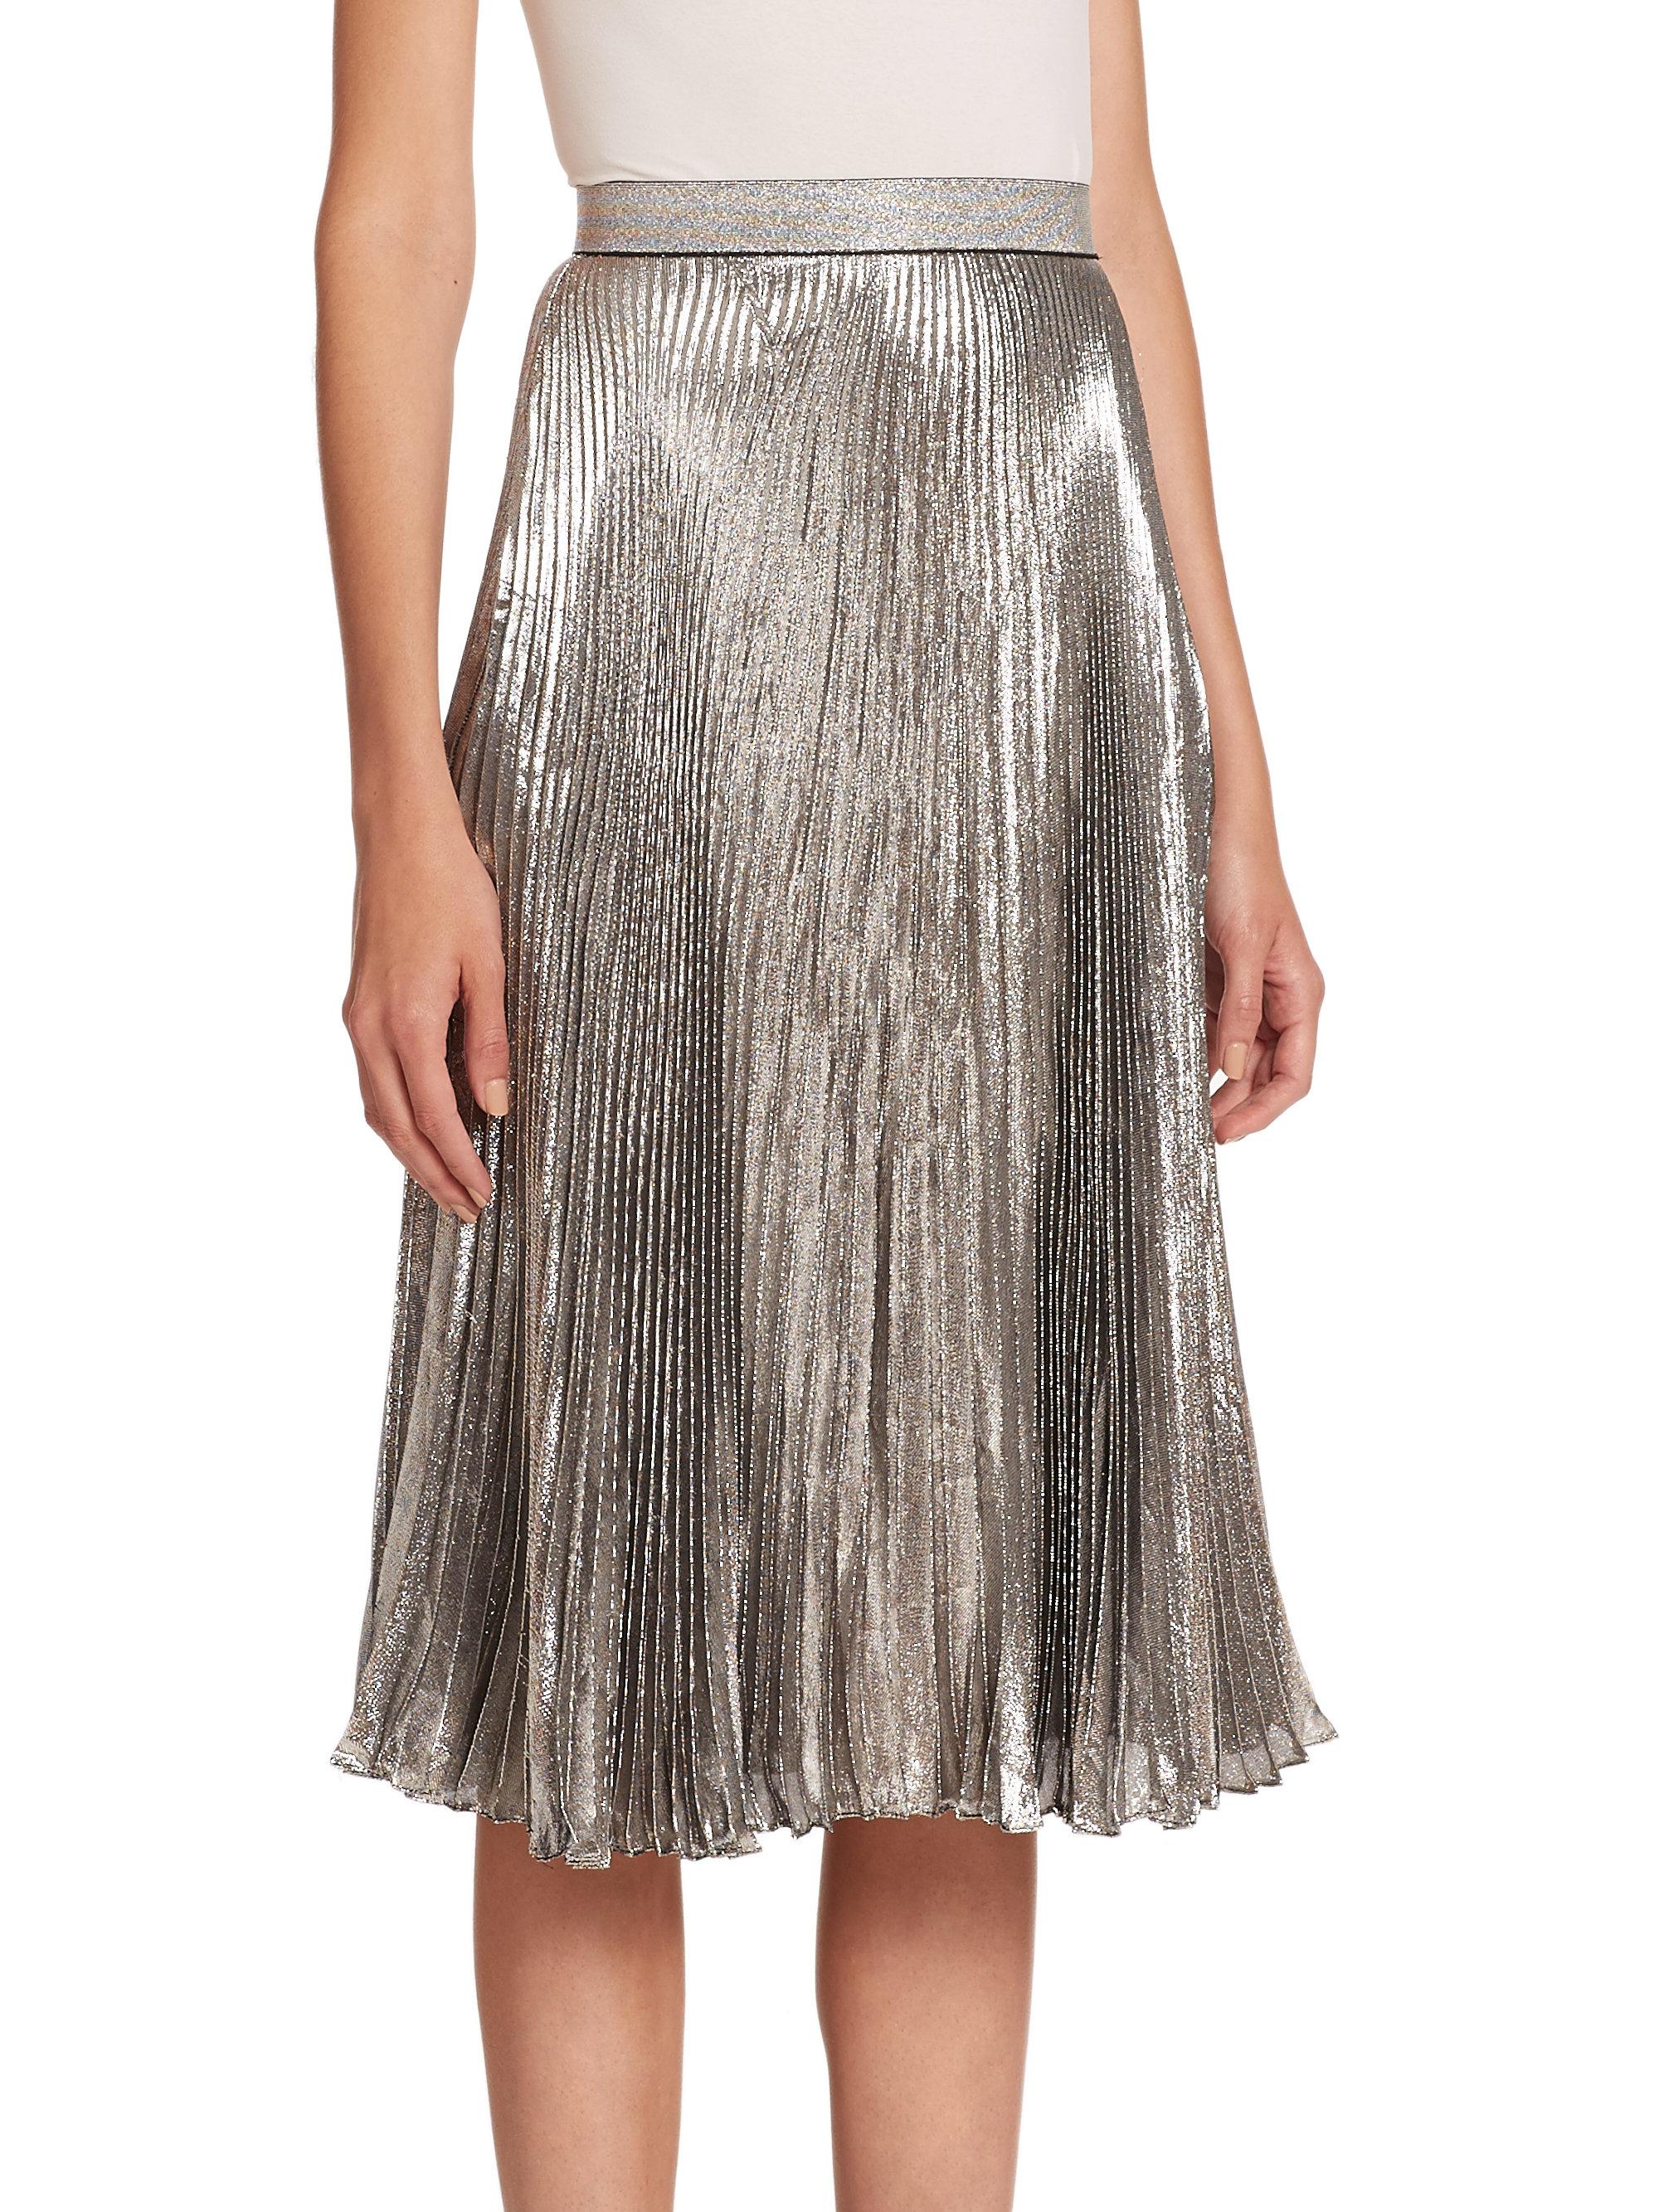 Christopher kane Pleated Midi Skirt in Metallic | Lyst